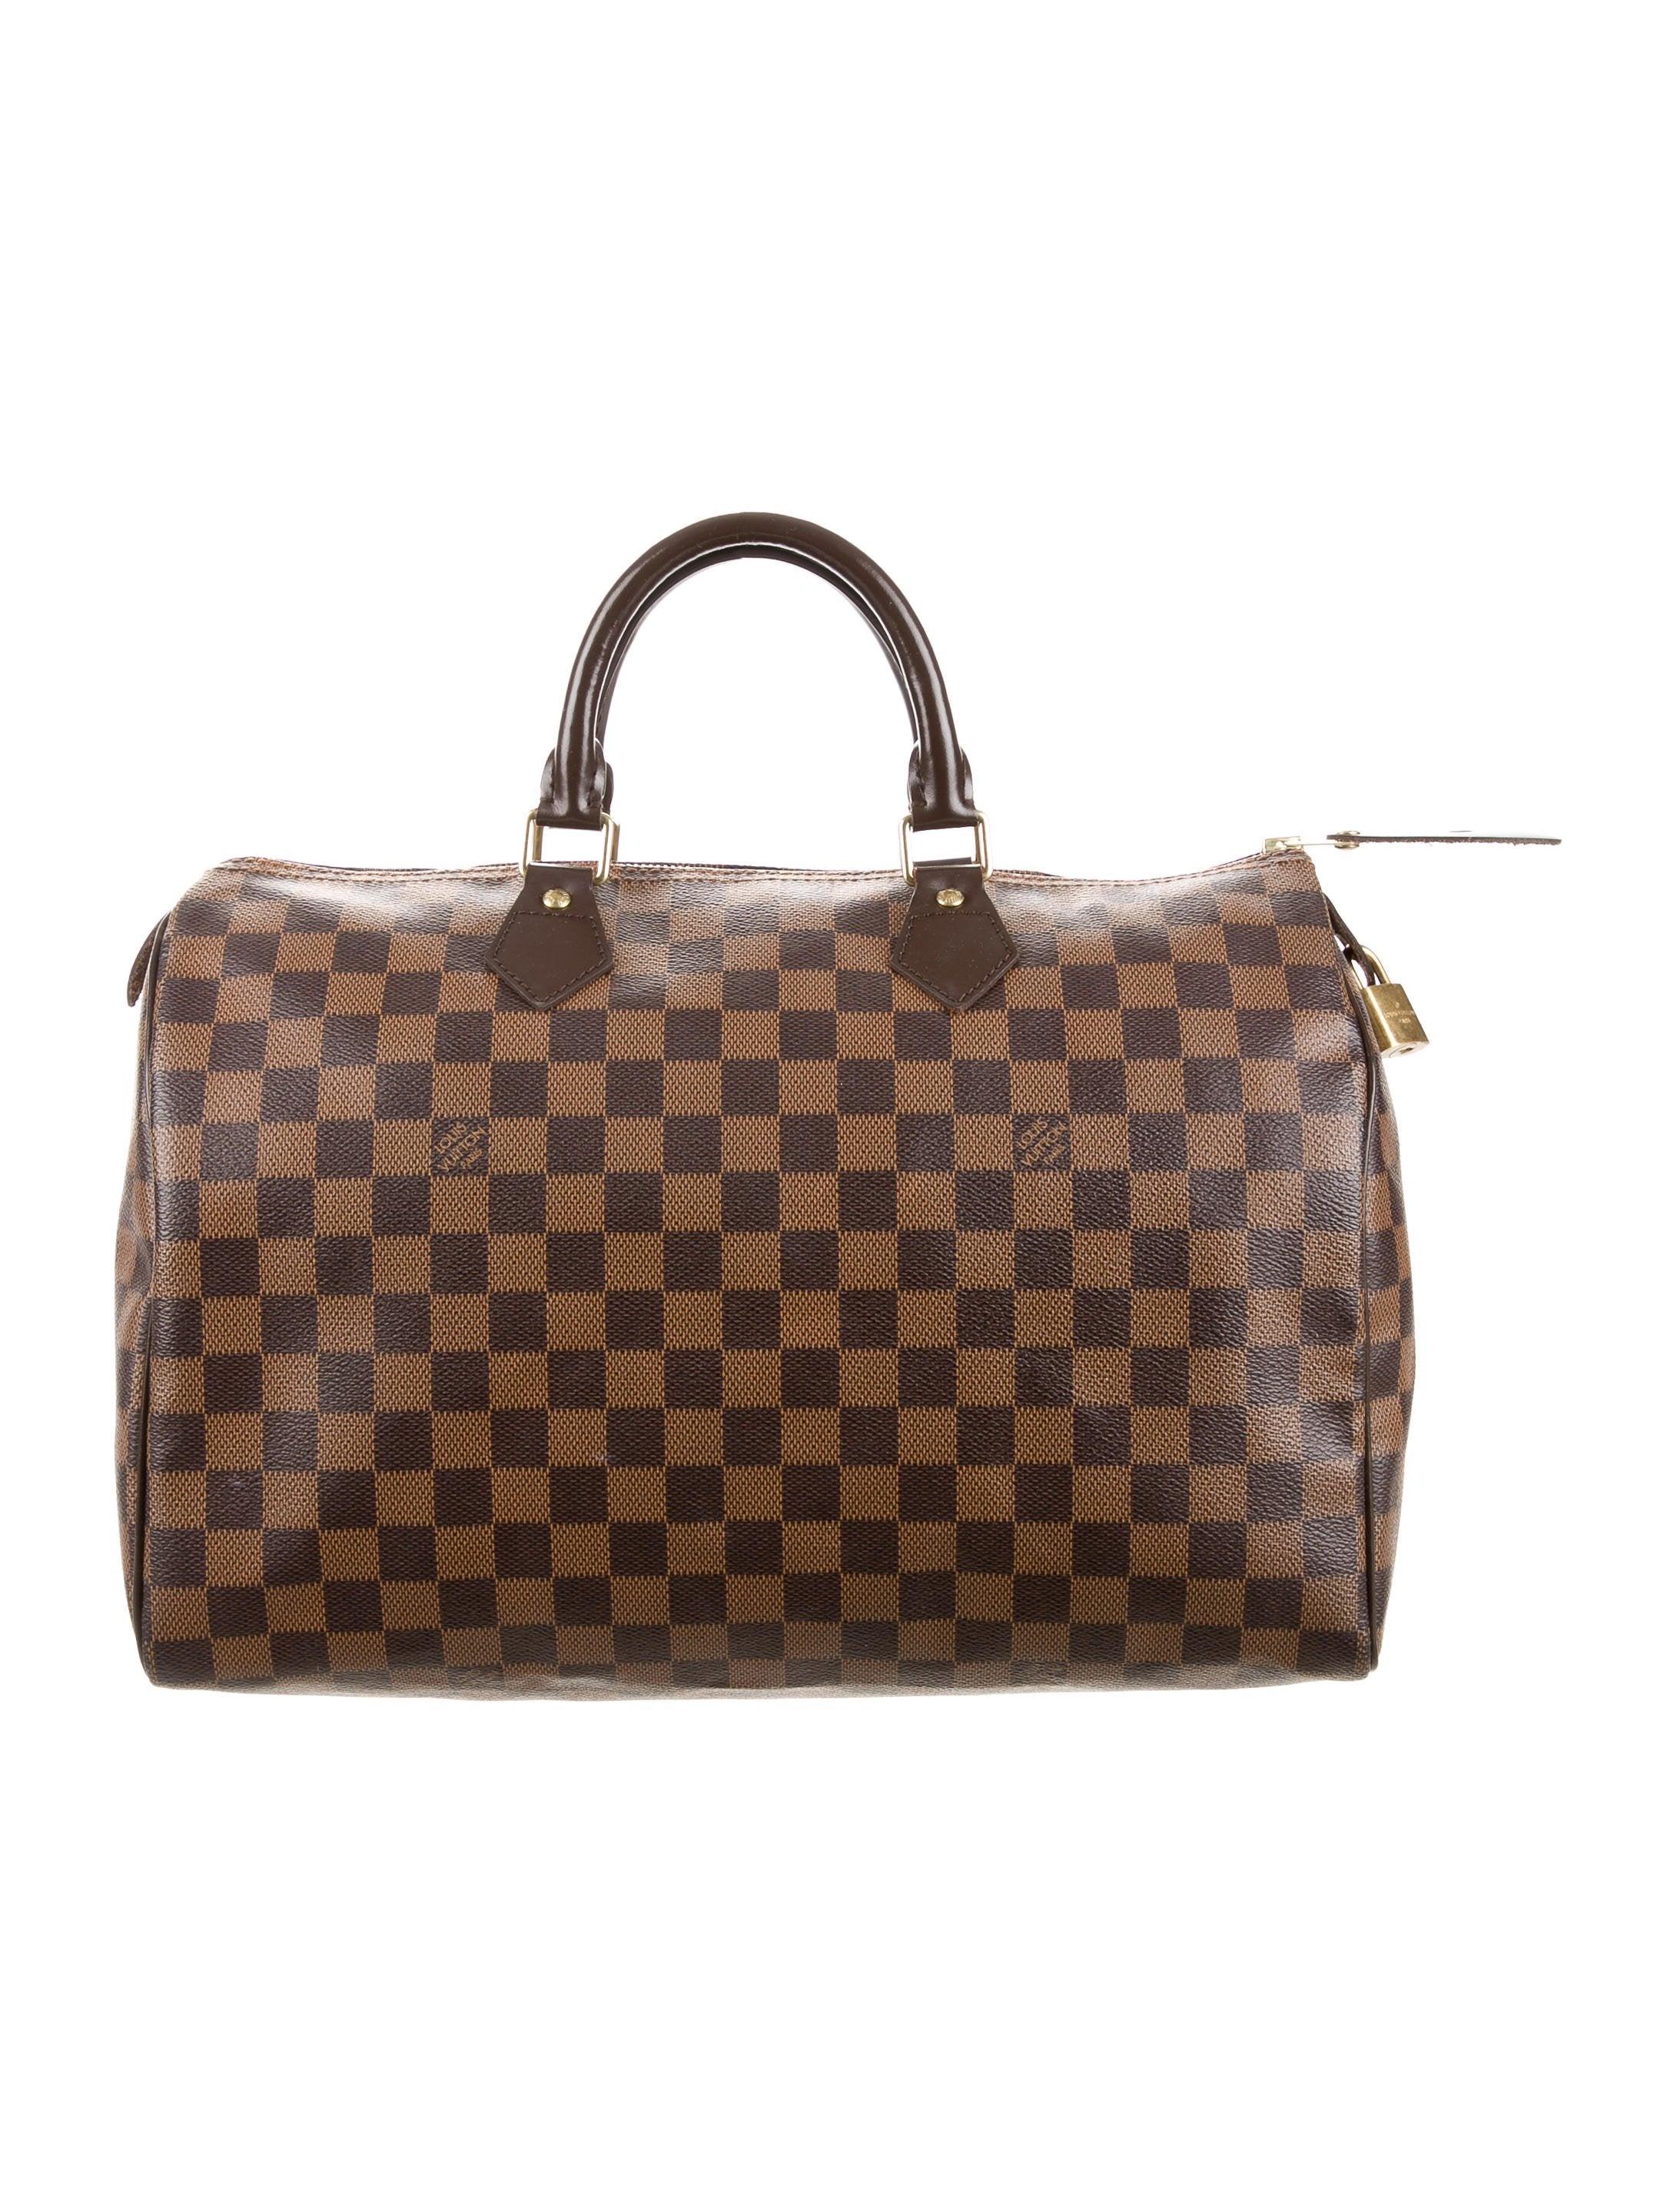 louis vuitton damier ebene speedy 35 handbags. Black Bedroom Furniture Sets. Home Design Ideas